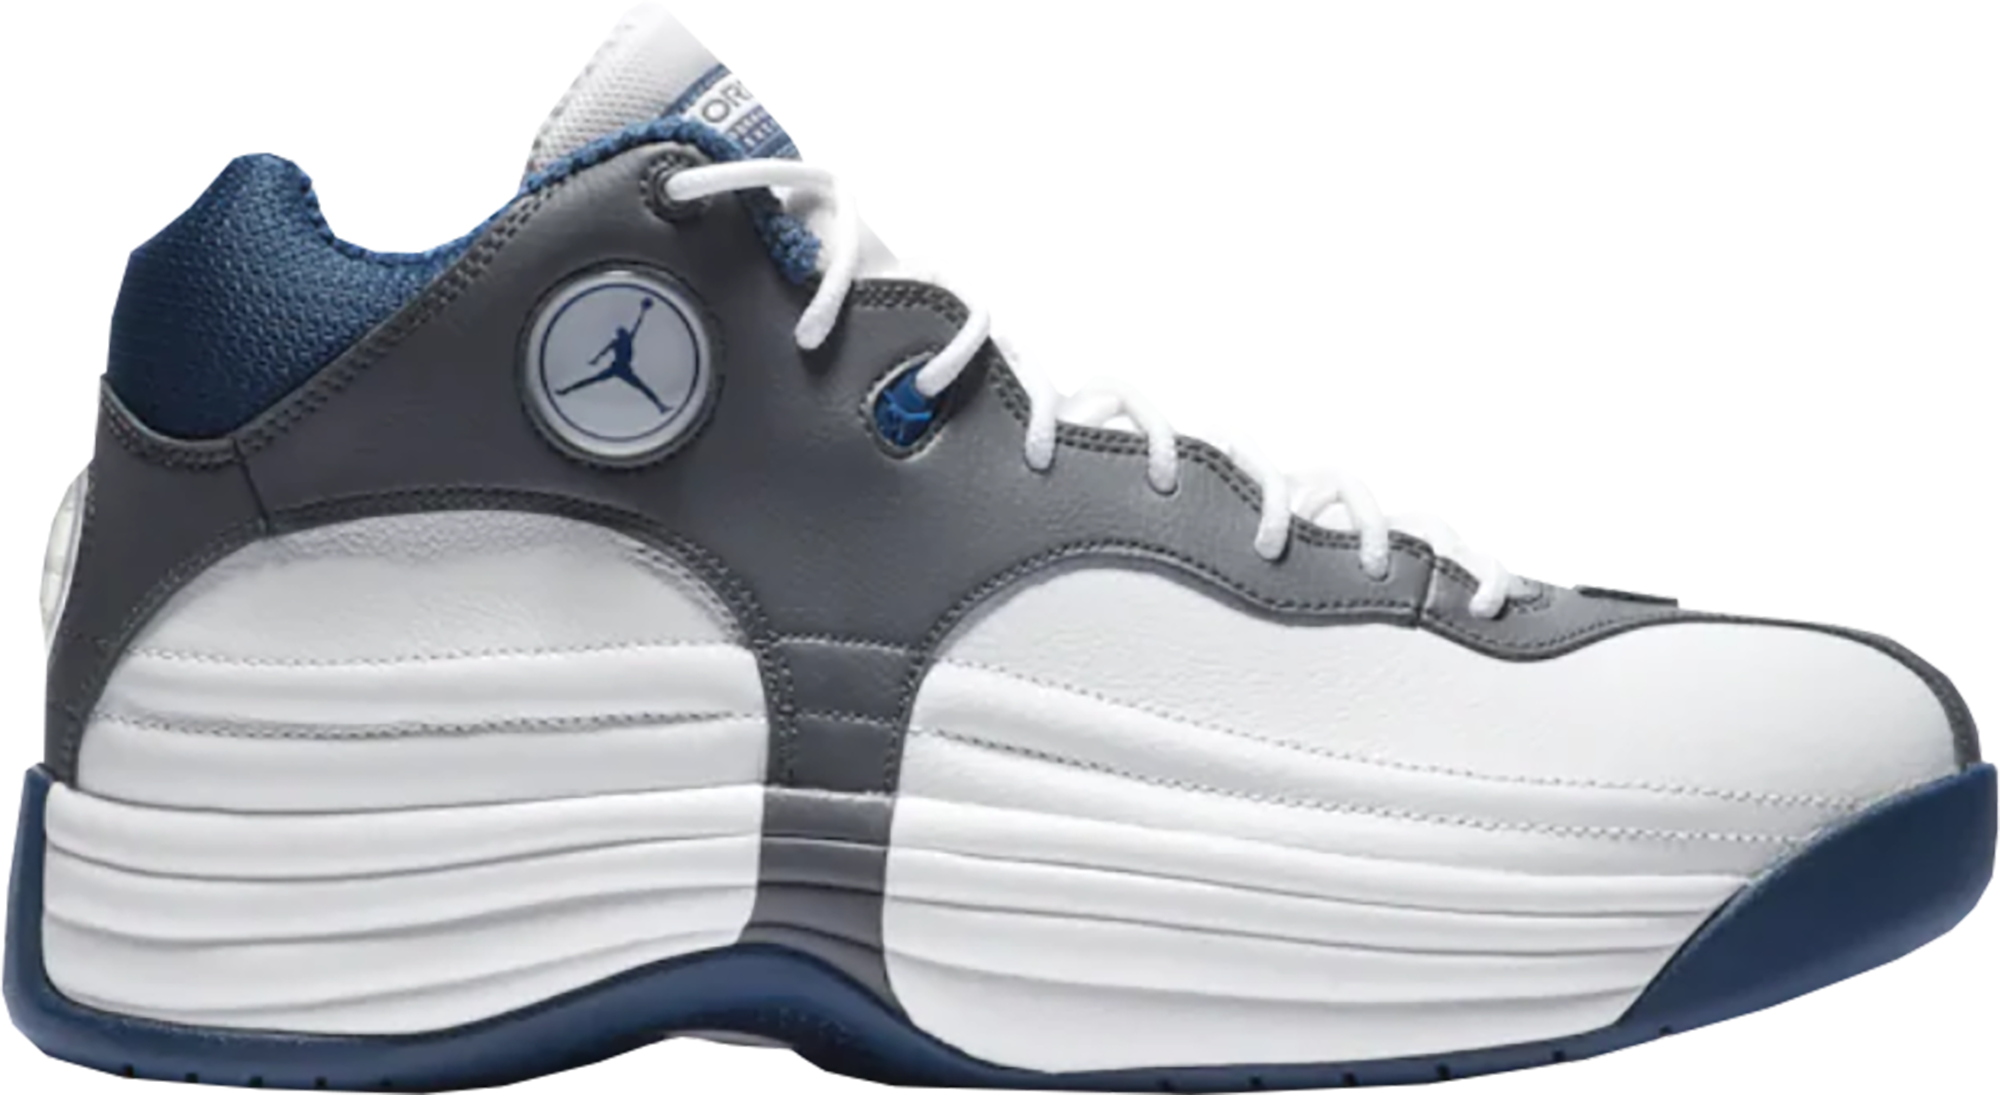 Jordan Jumpman Team 1 Flint - Sneakers